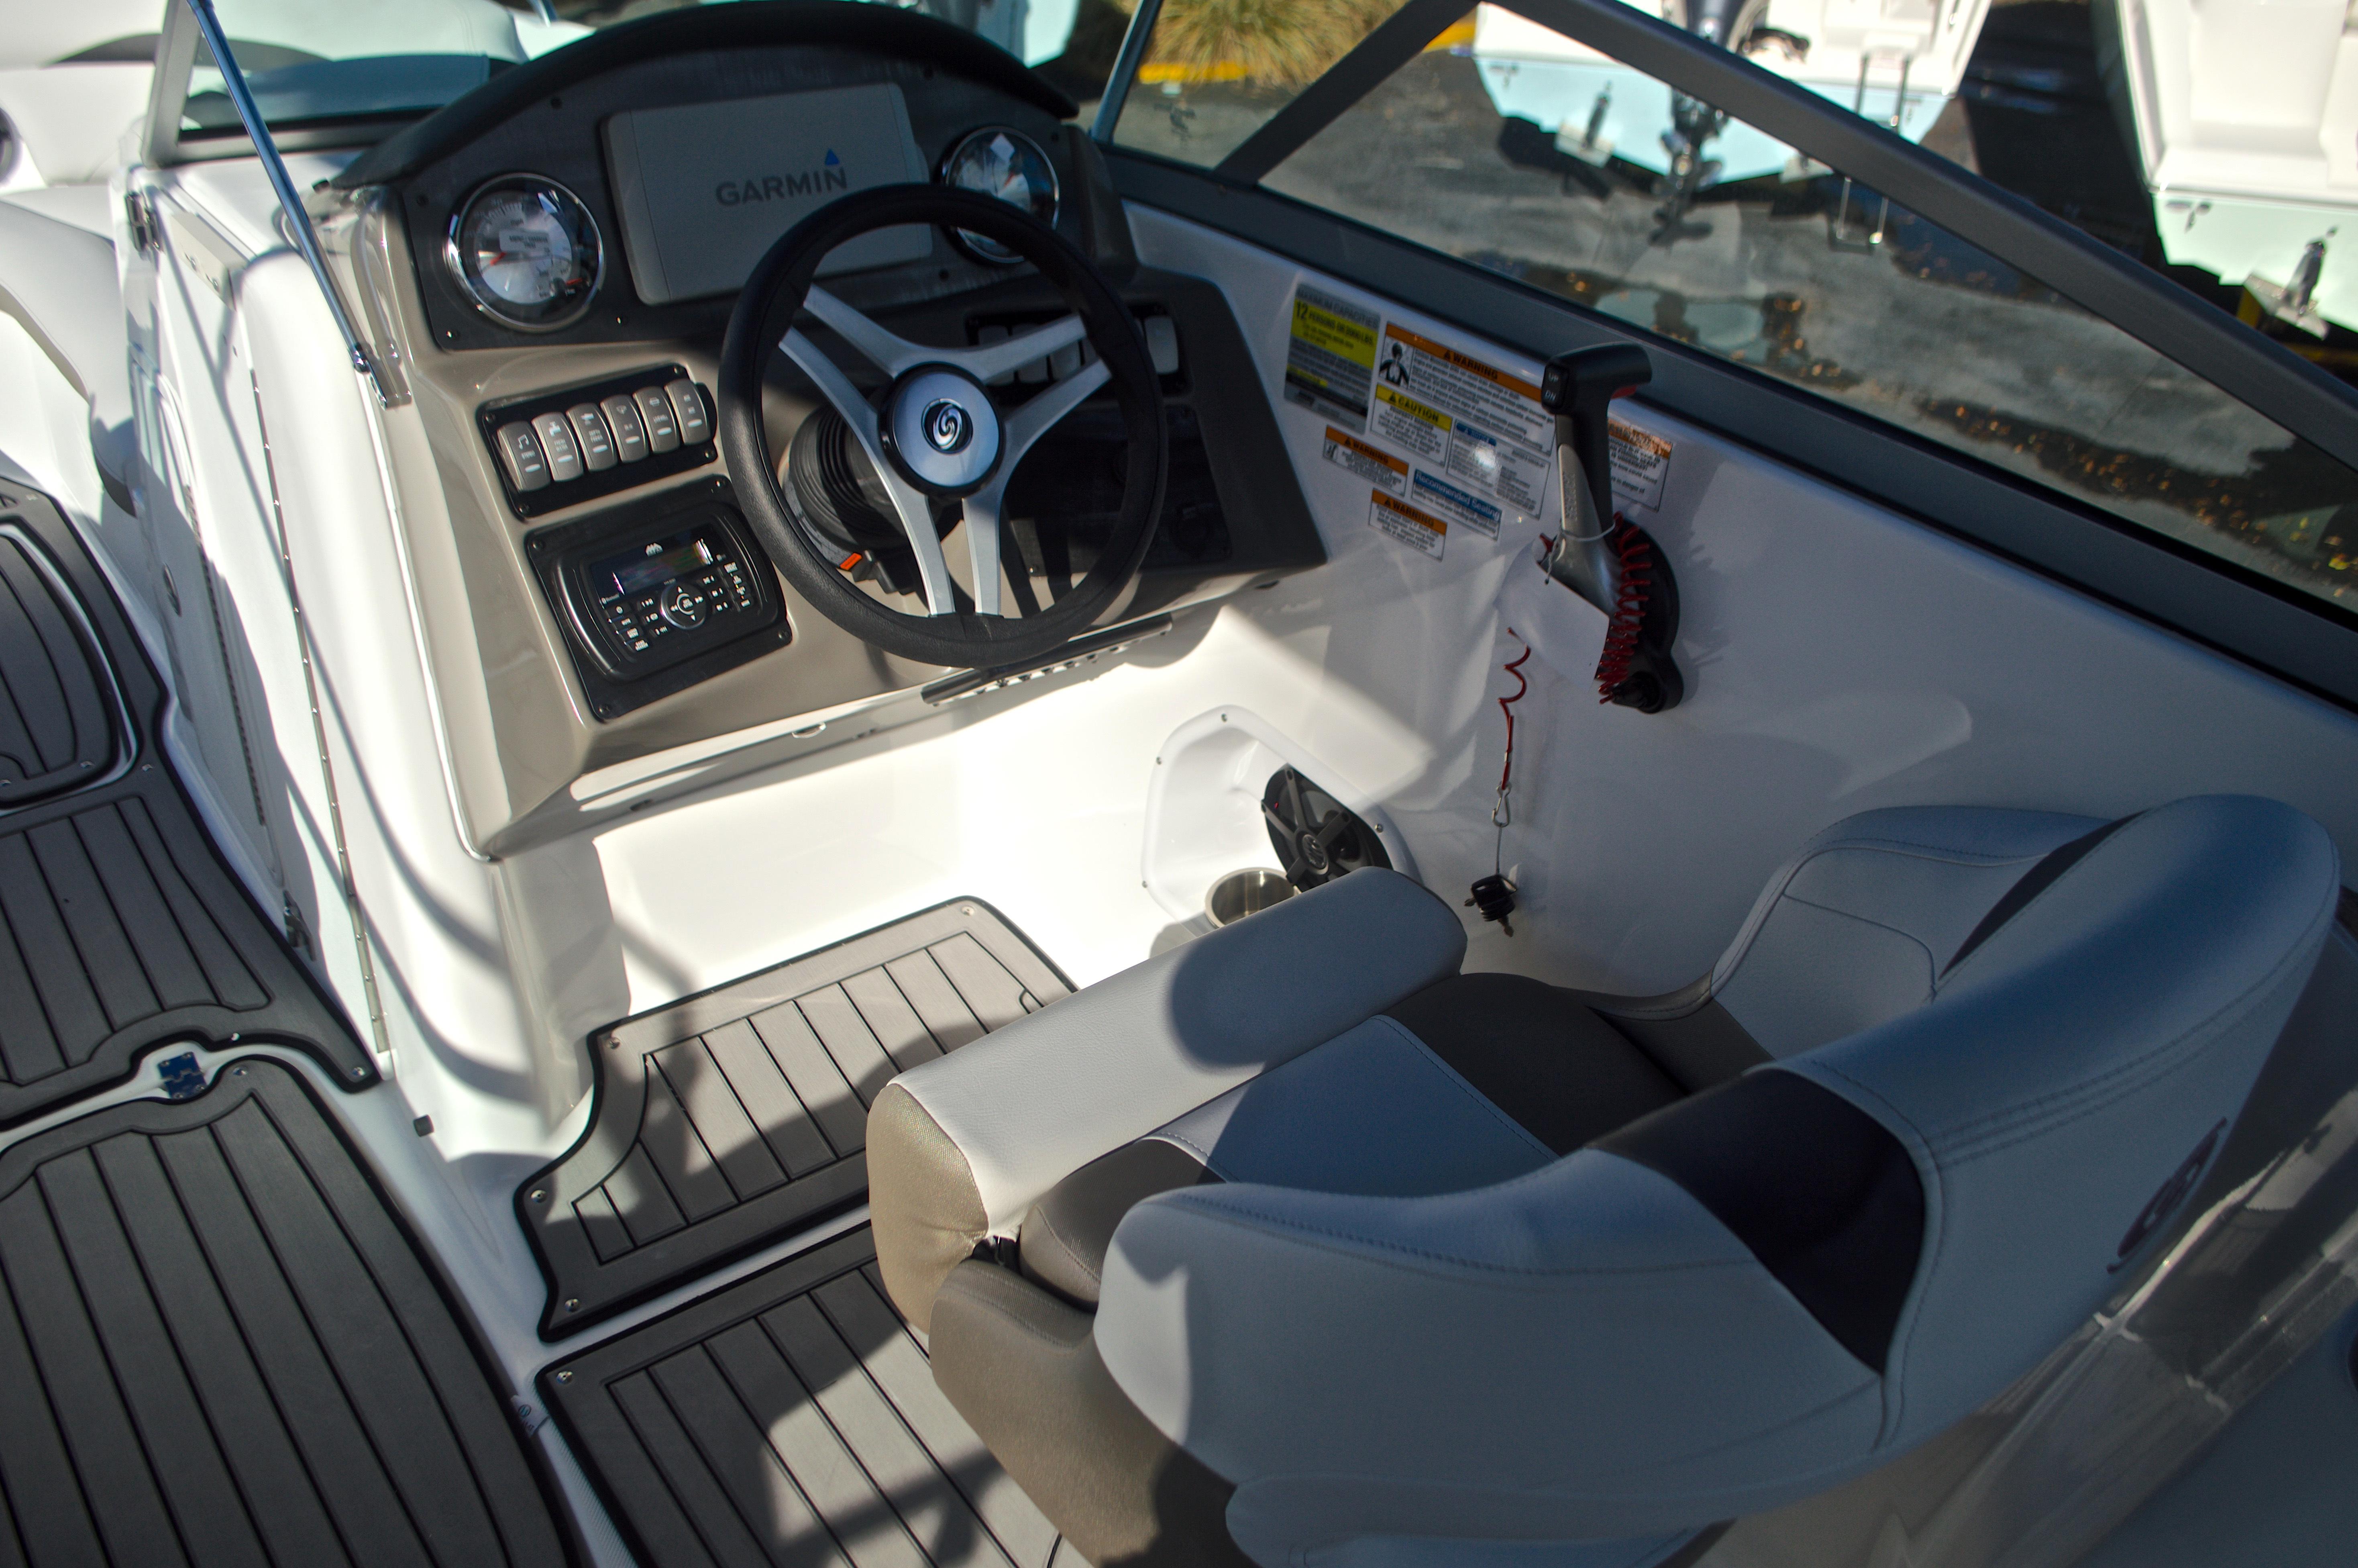 Thumbnail 38 for New 2017 Hurricane SunDeck SD 2400 OB boat for sale in Miami, FL